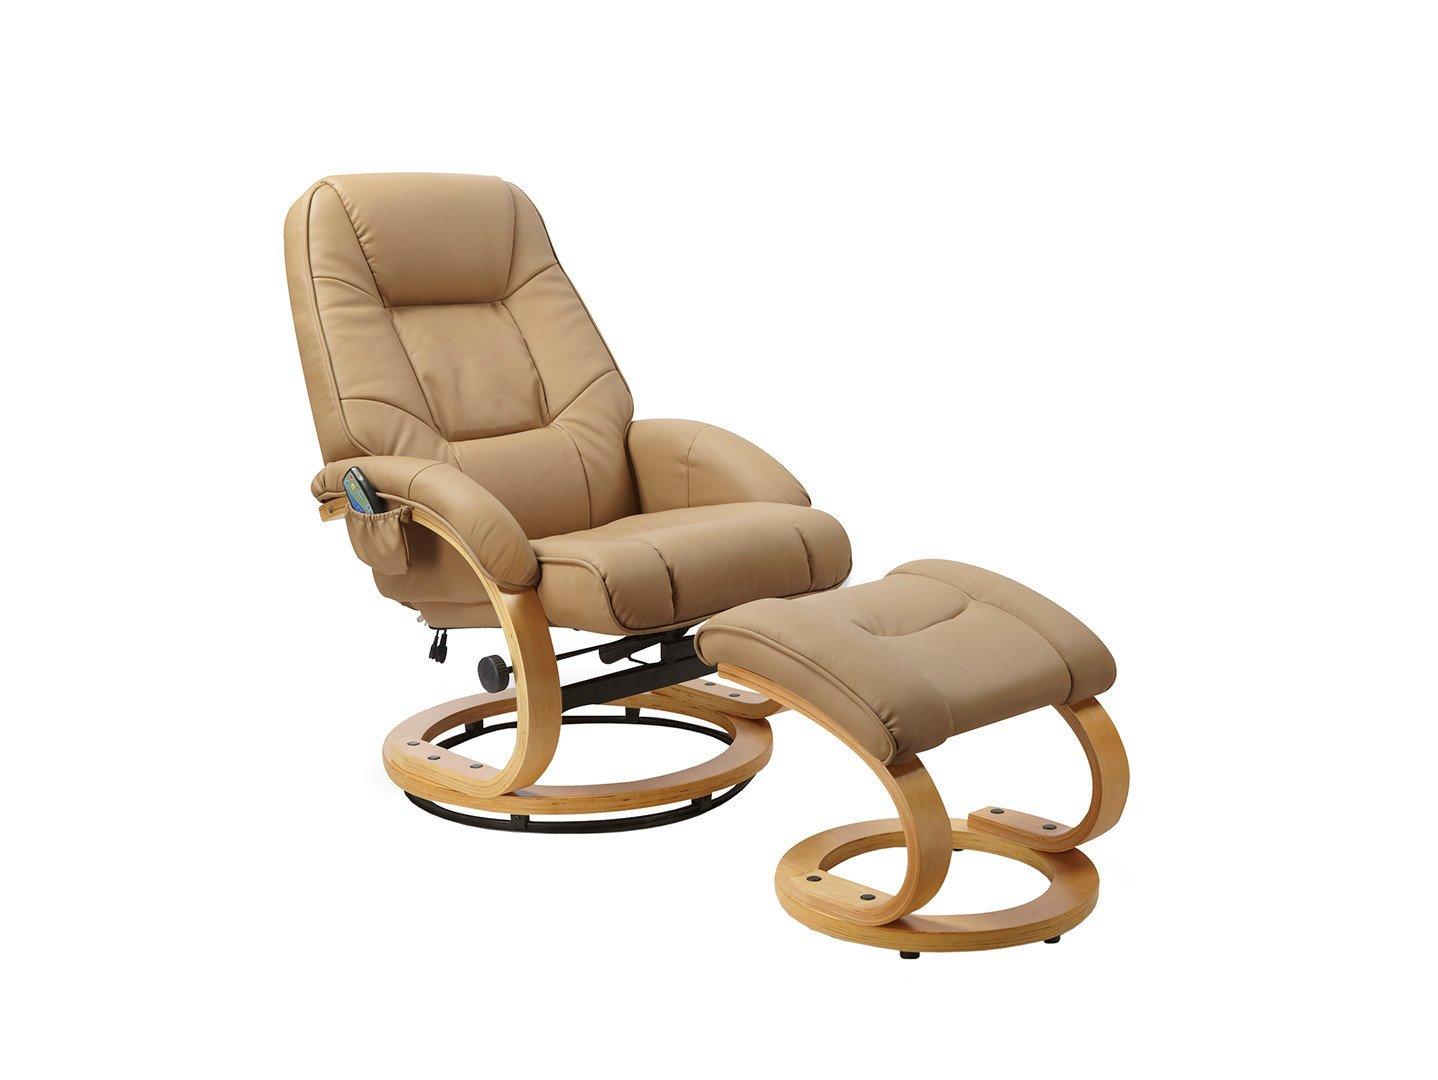 Fotel rozkładany Matador